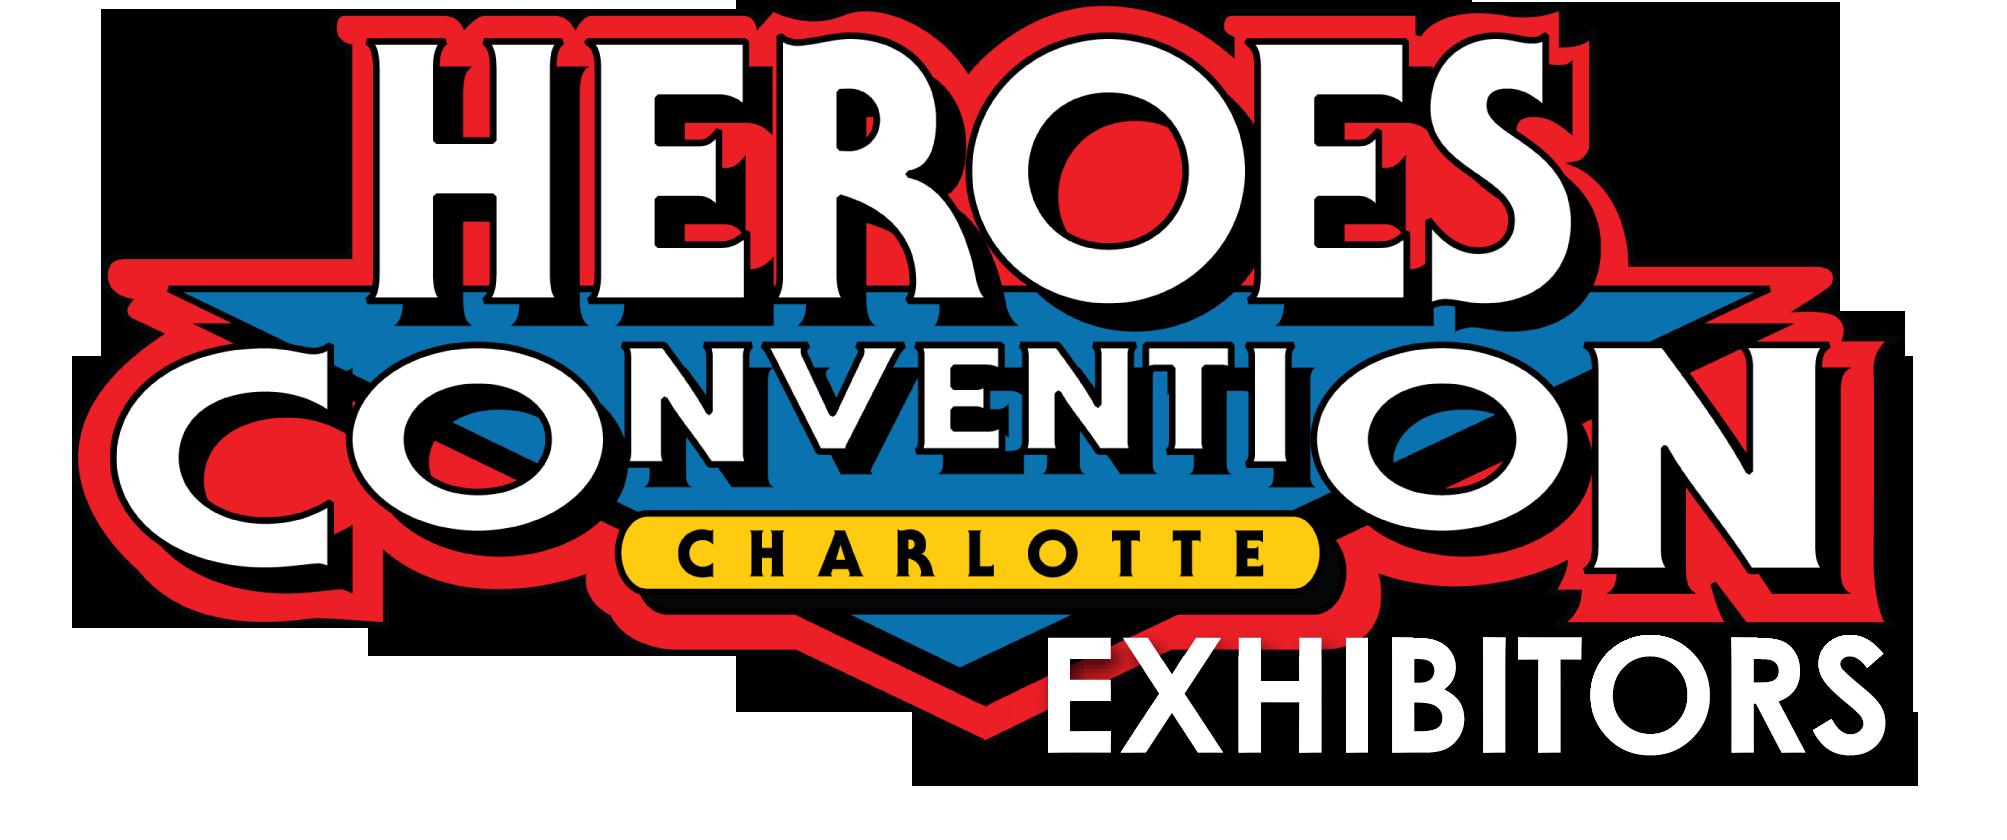 hc-logo exhibitors